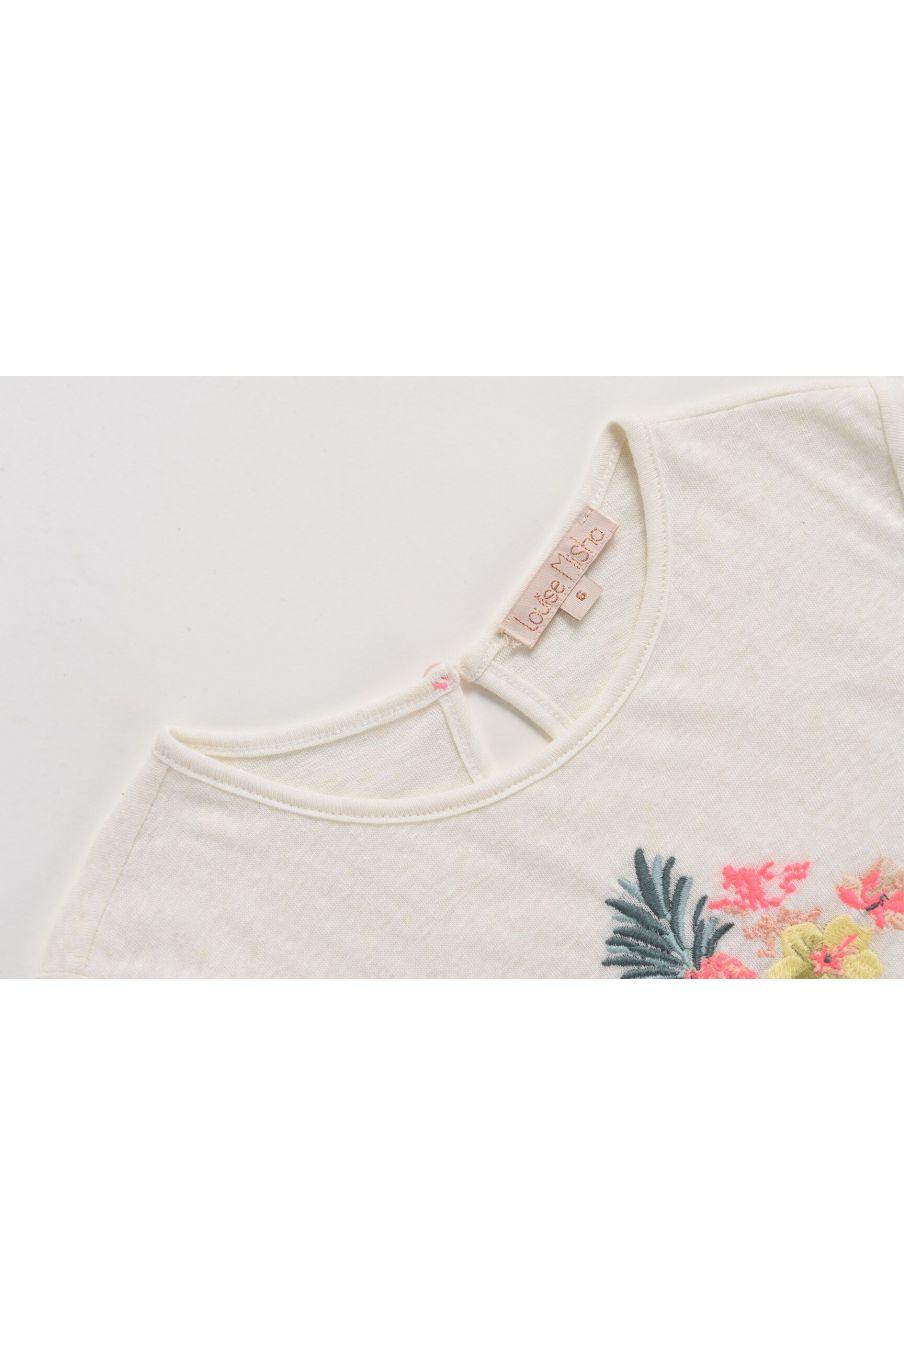 boheme chic vintage tee shirt fille adewale blanc